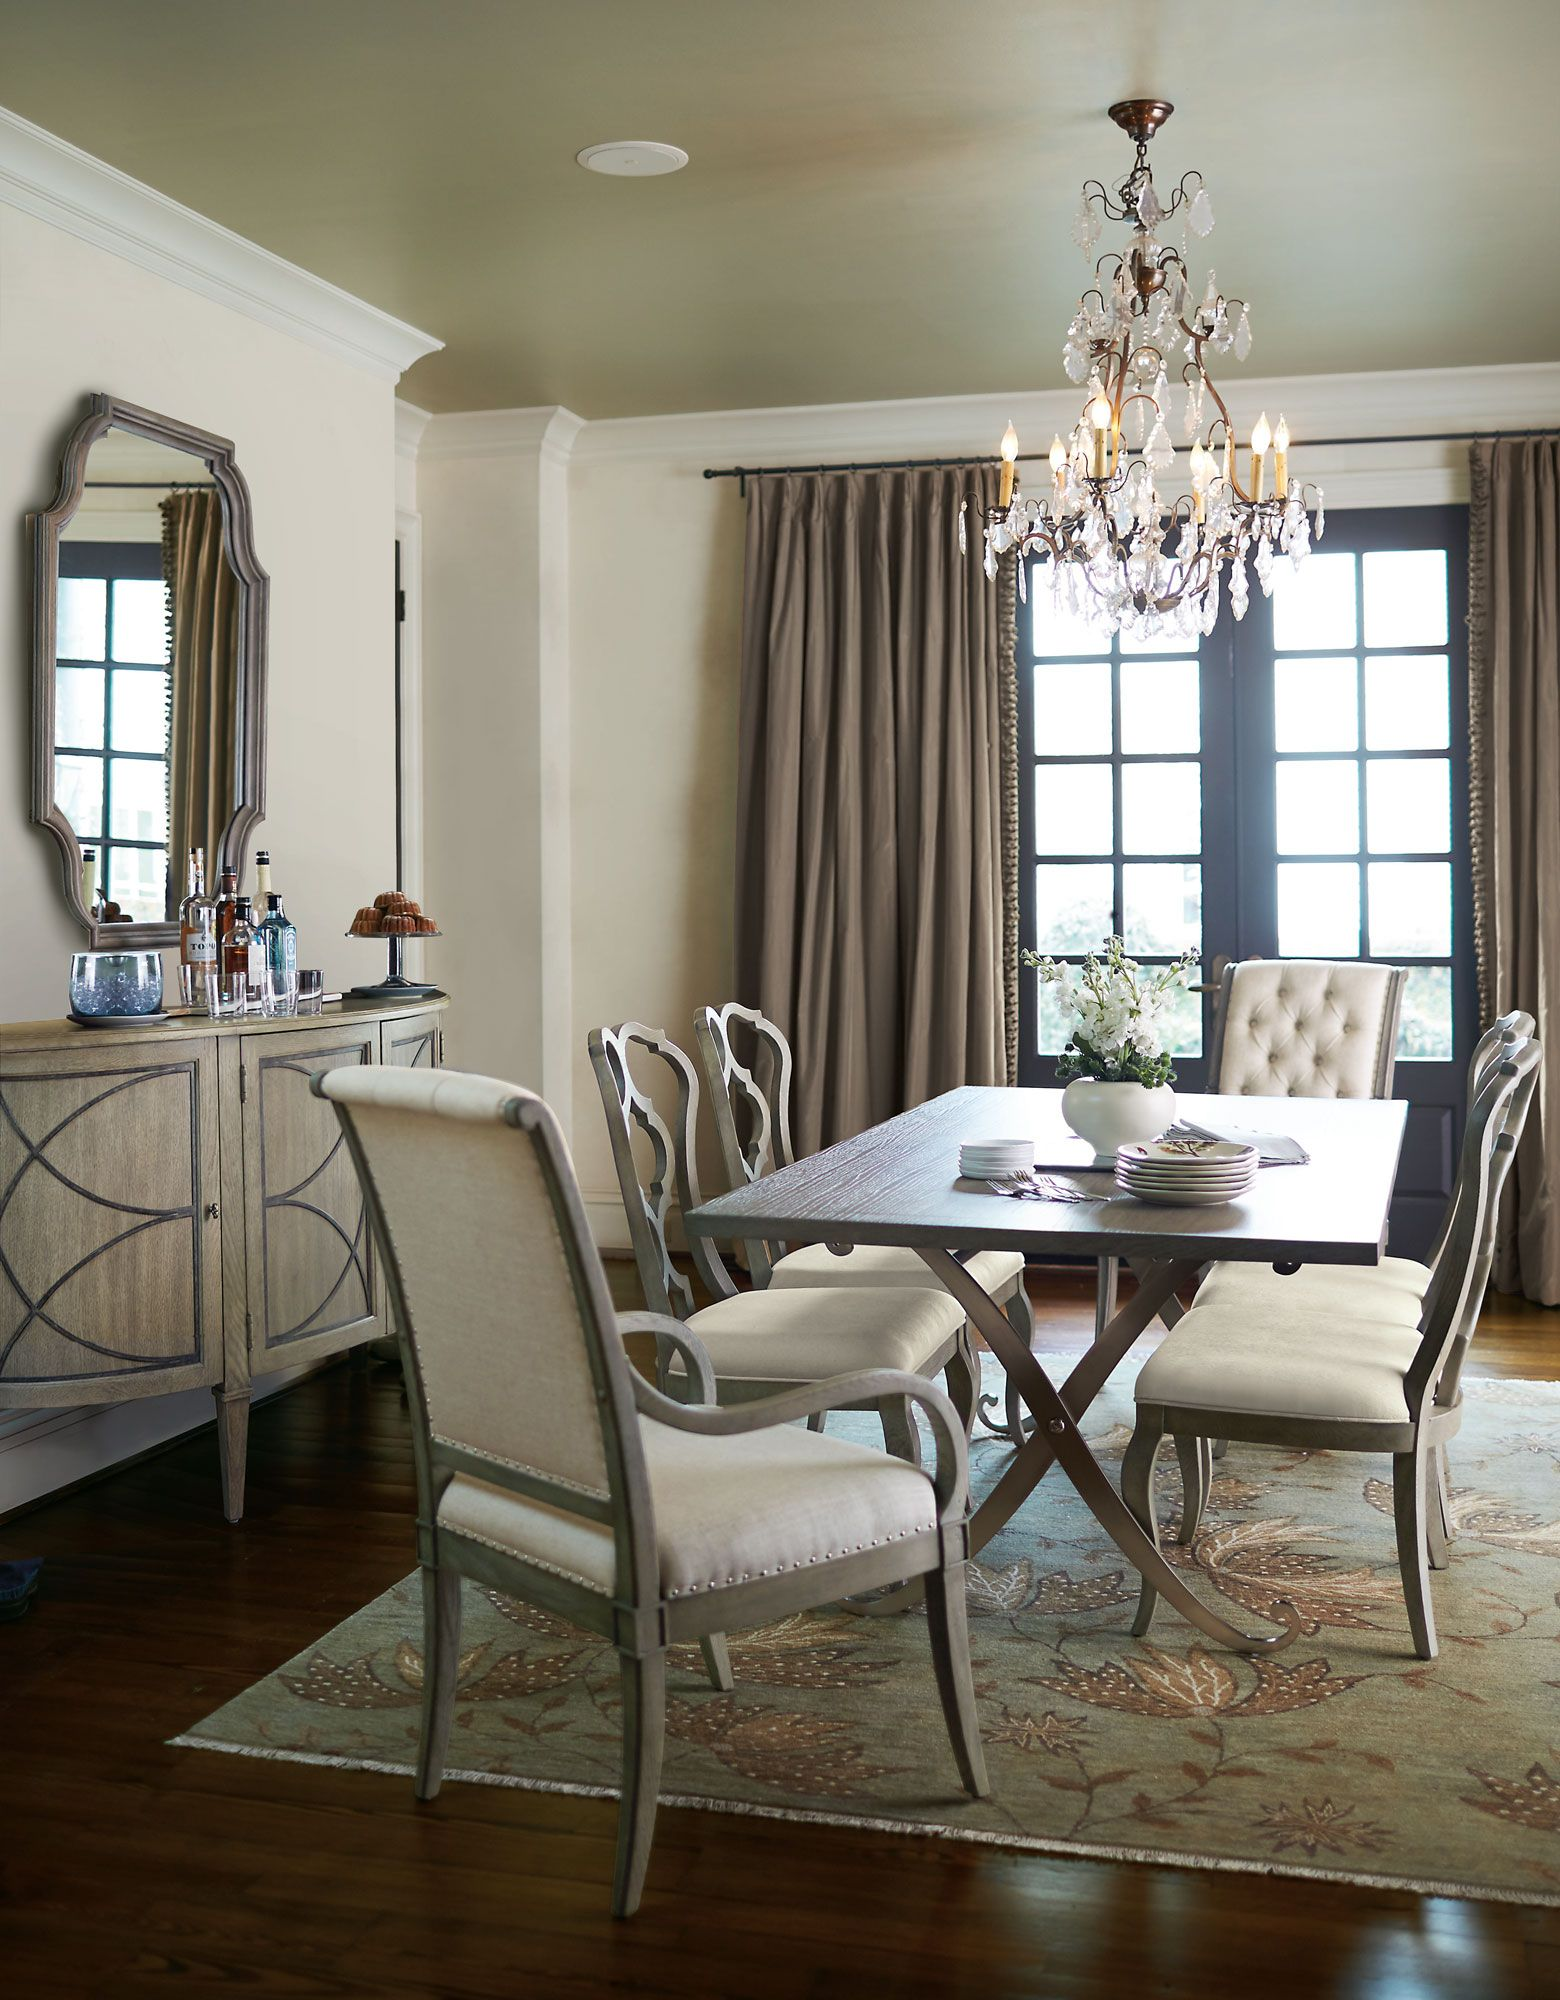 Bernhardt Marquesa 7 Piece Rectangular Dining Room Set In Gray Cashmere